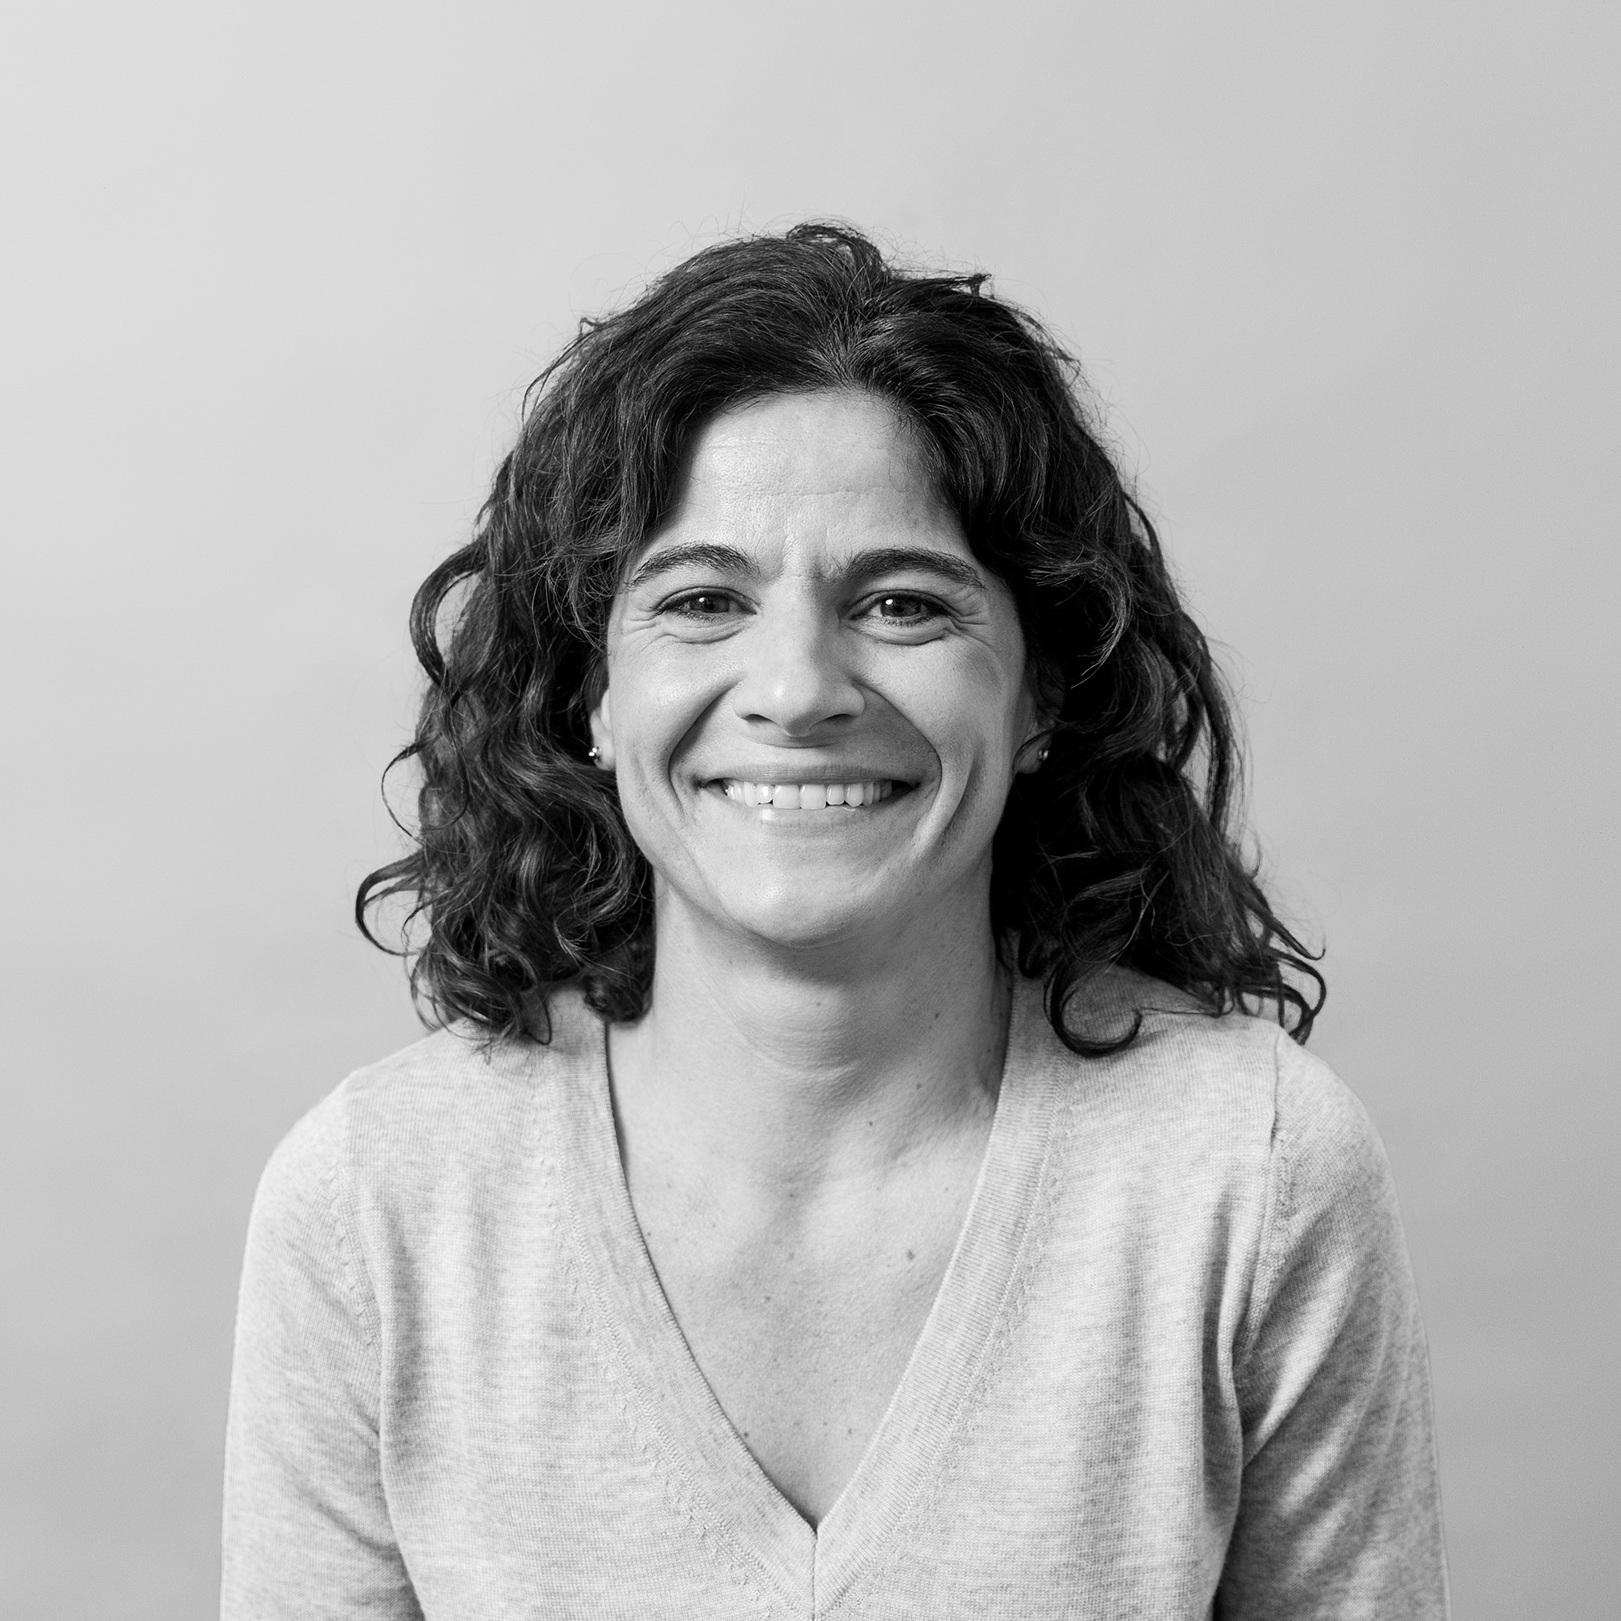 Graciela Moreno - Urban Design Director